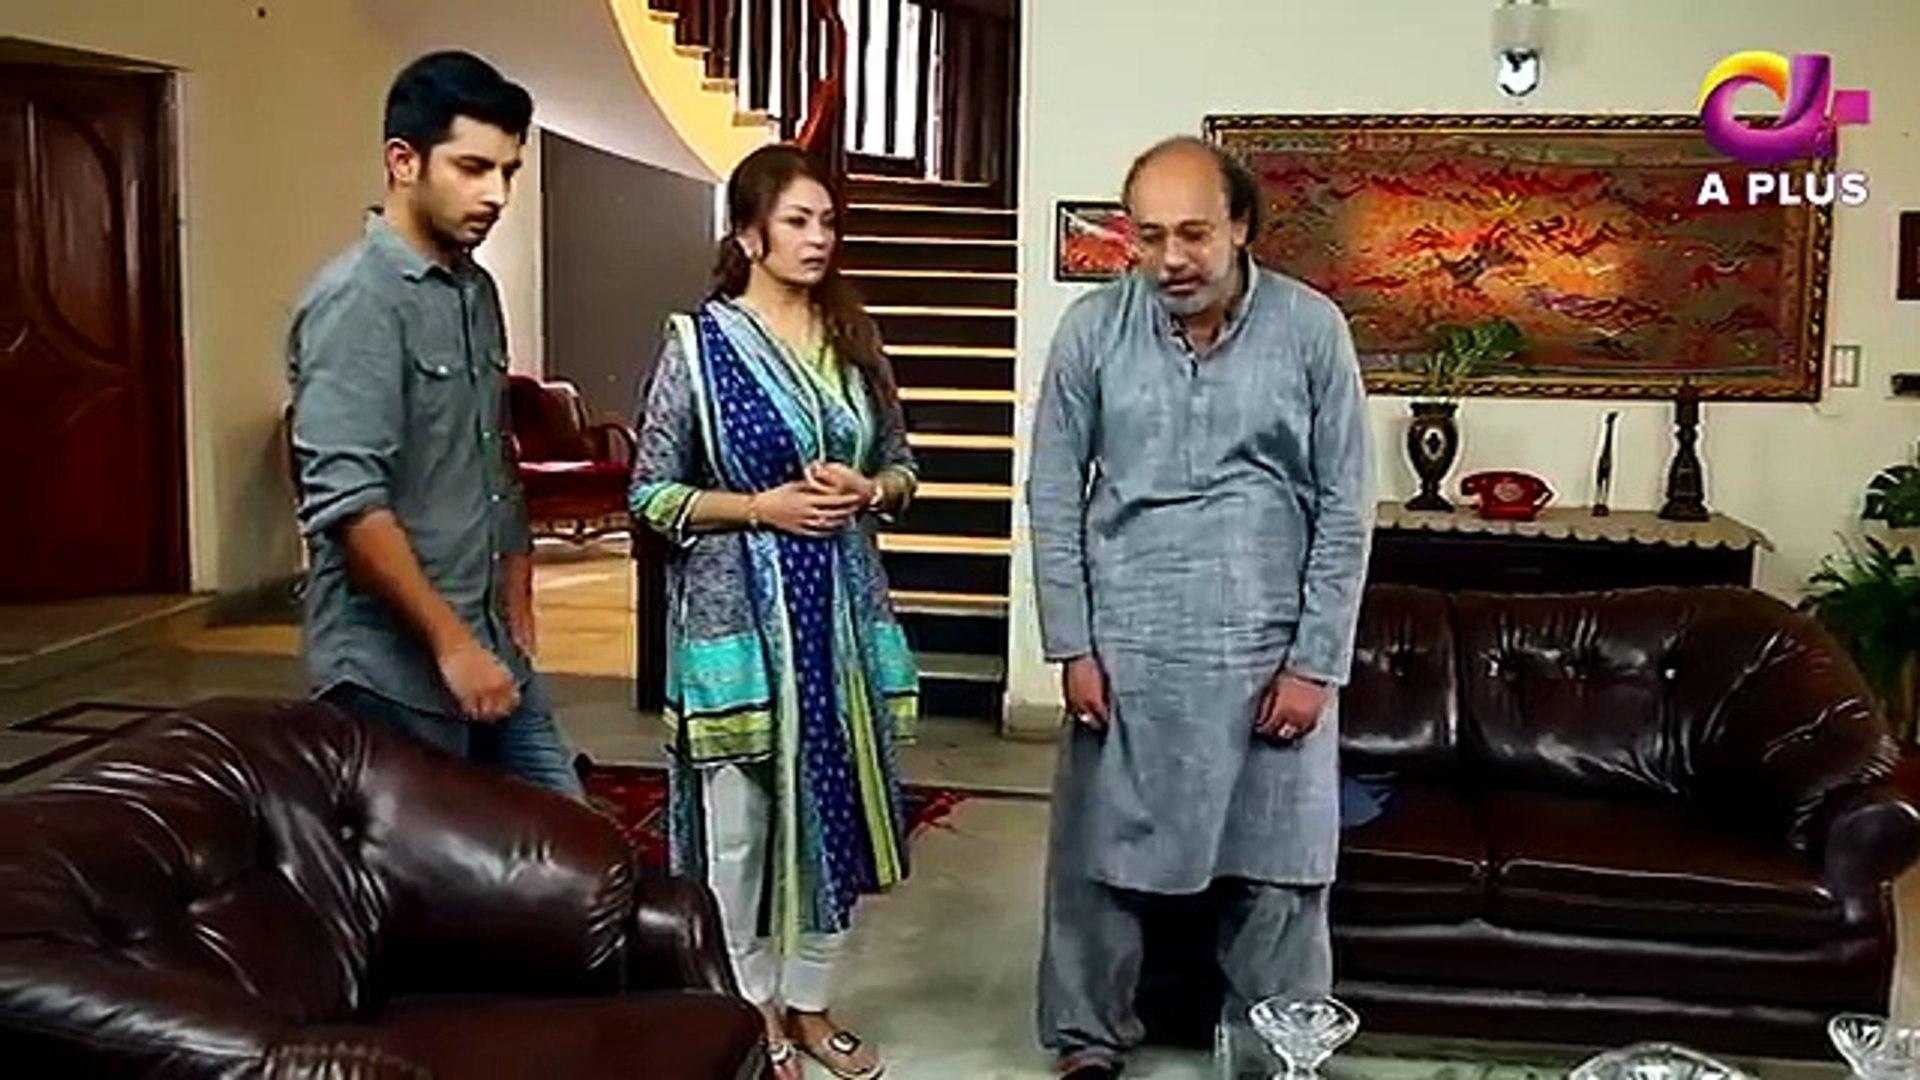 Lamhay - Episode 22 - Aplus Dramas - Saima Noor, Sarmad Khoosat - Pakistani Drama